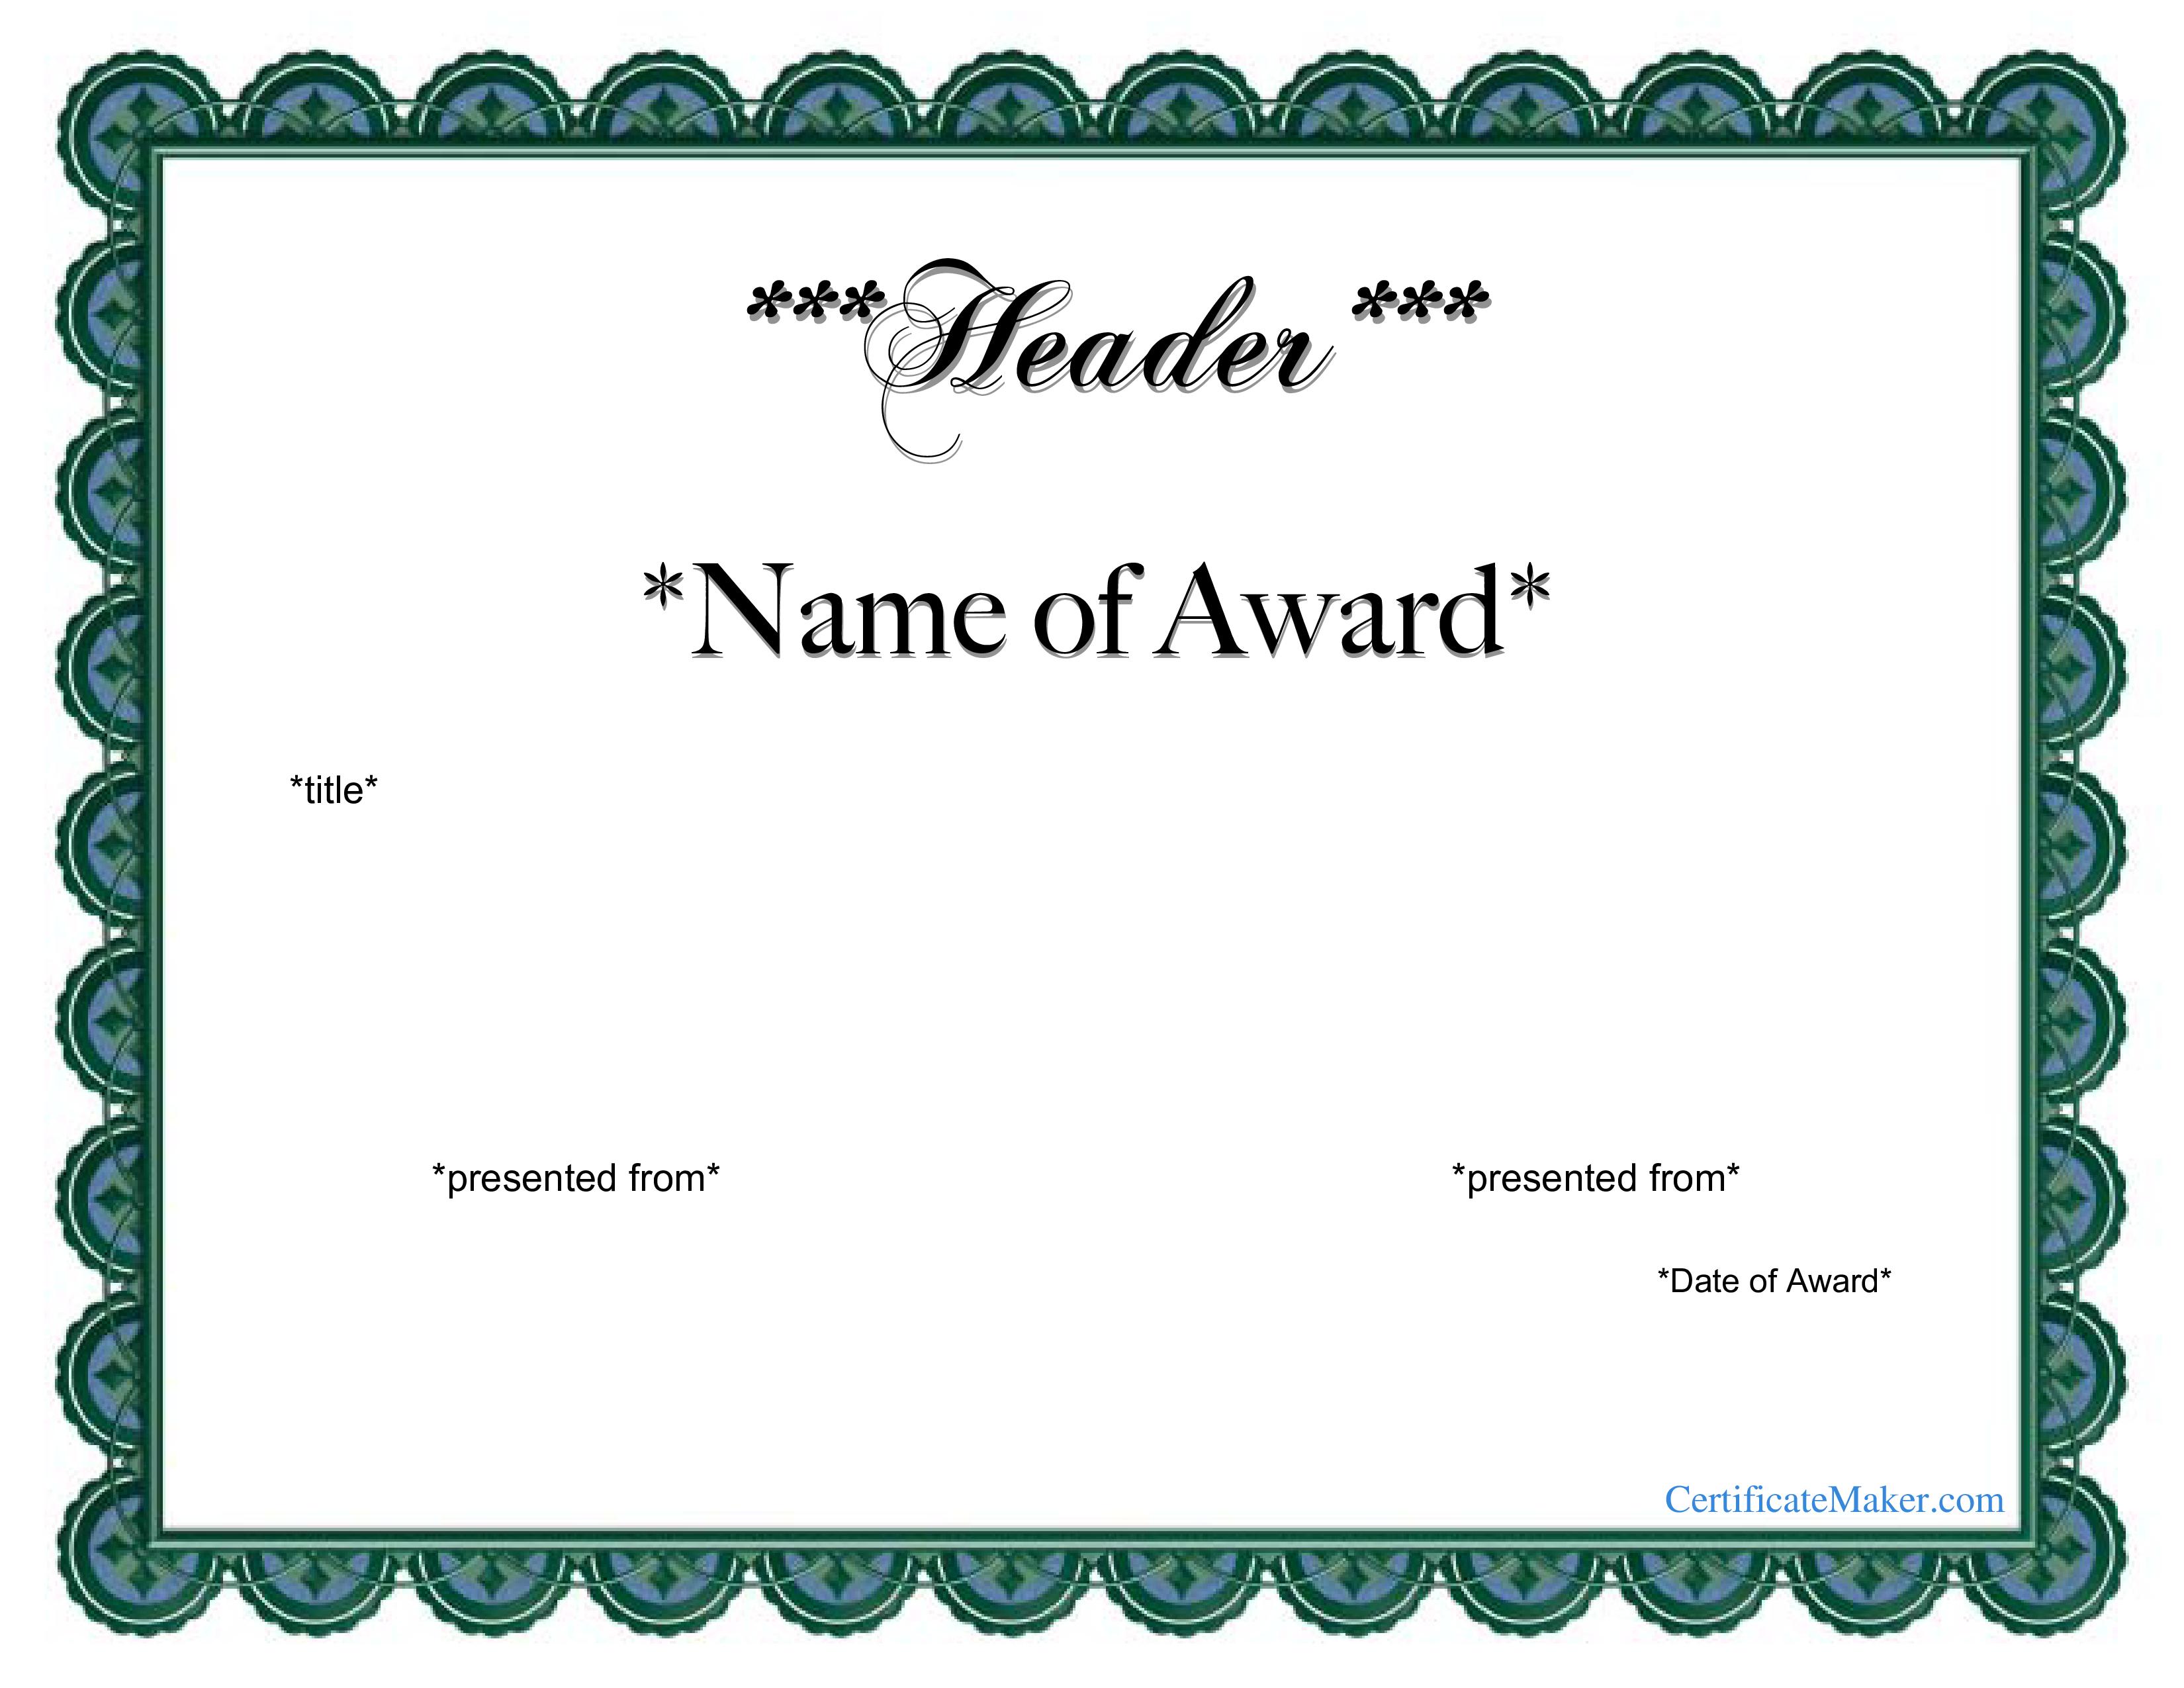 Free Printable Award Certificate | Templates At Allbusinesstemplates - Free Printable Certificate Templates